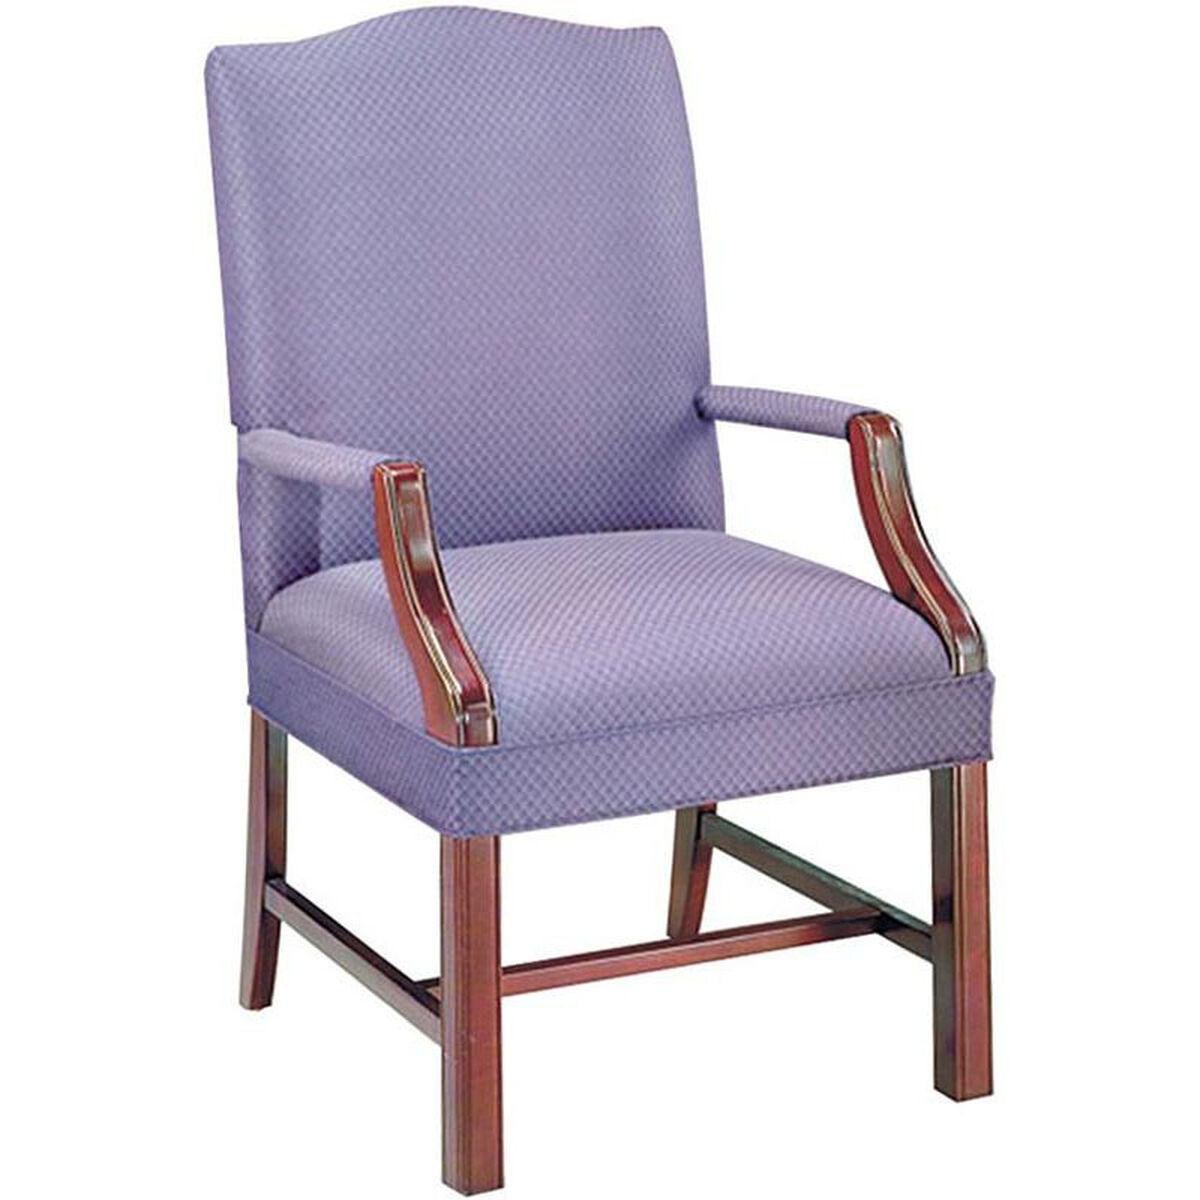 High Point Furniture Industries Quick Ship Value Traditional Martha Washington Guest Chair 3473